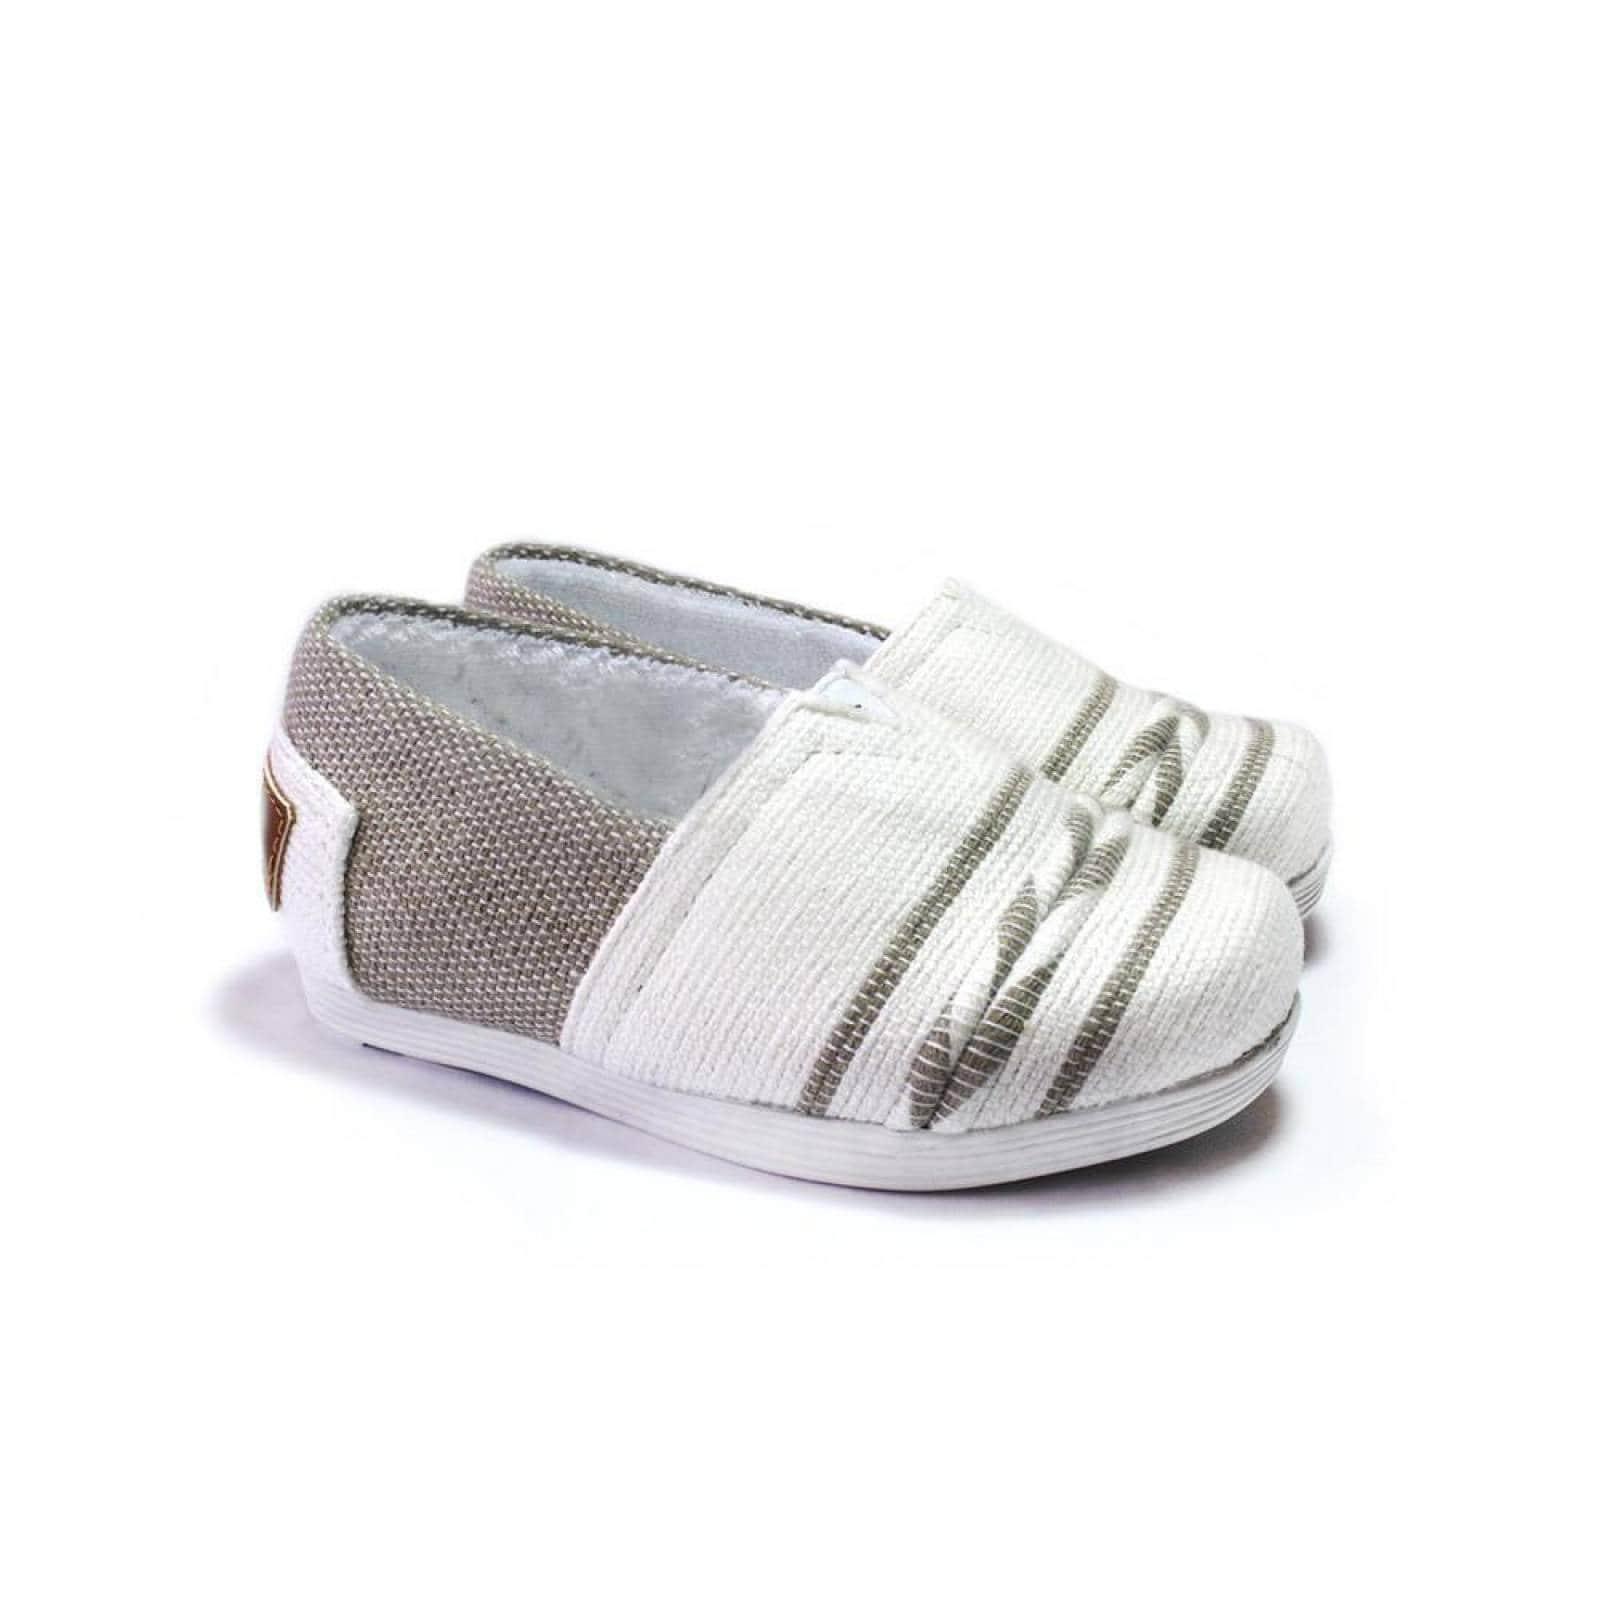 Zapato Alpargata Mini Jacinta Artesanal Tela Infantil Beige Komoni Talla: 15